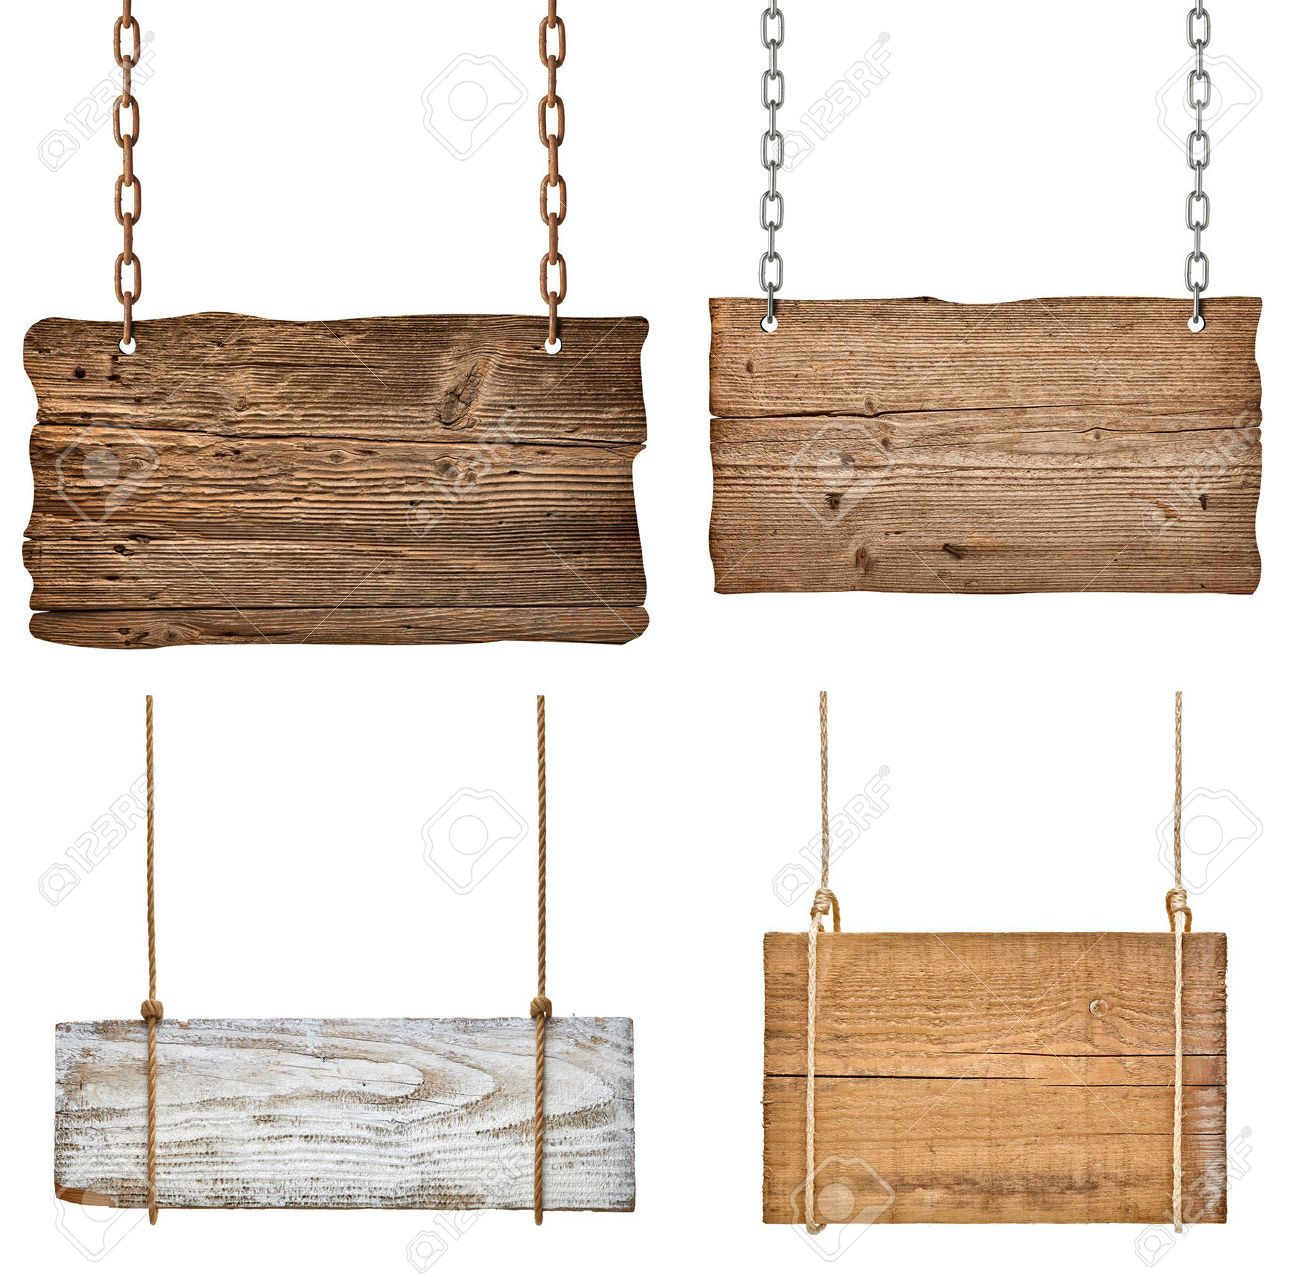 wooden signs google search inspirations pinterest. Black Bedroom Furniture Sets. Home Design Ideas